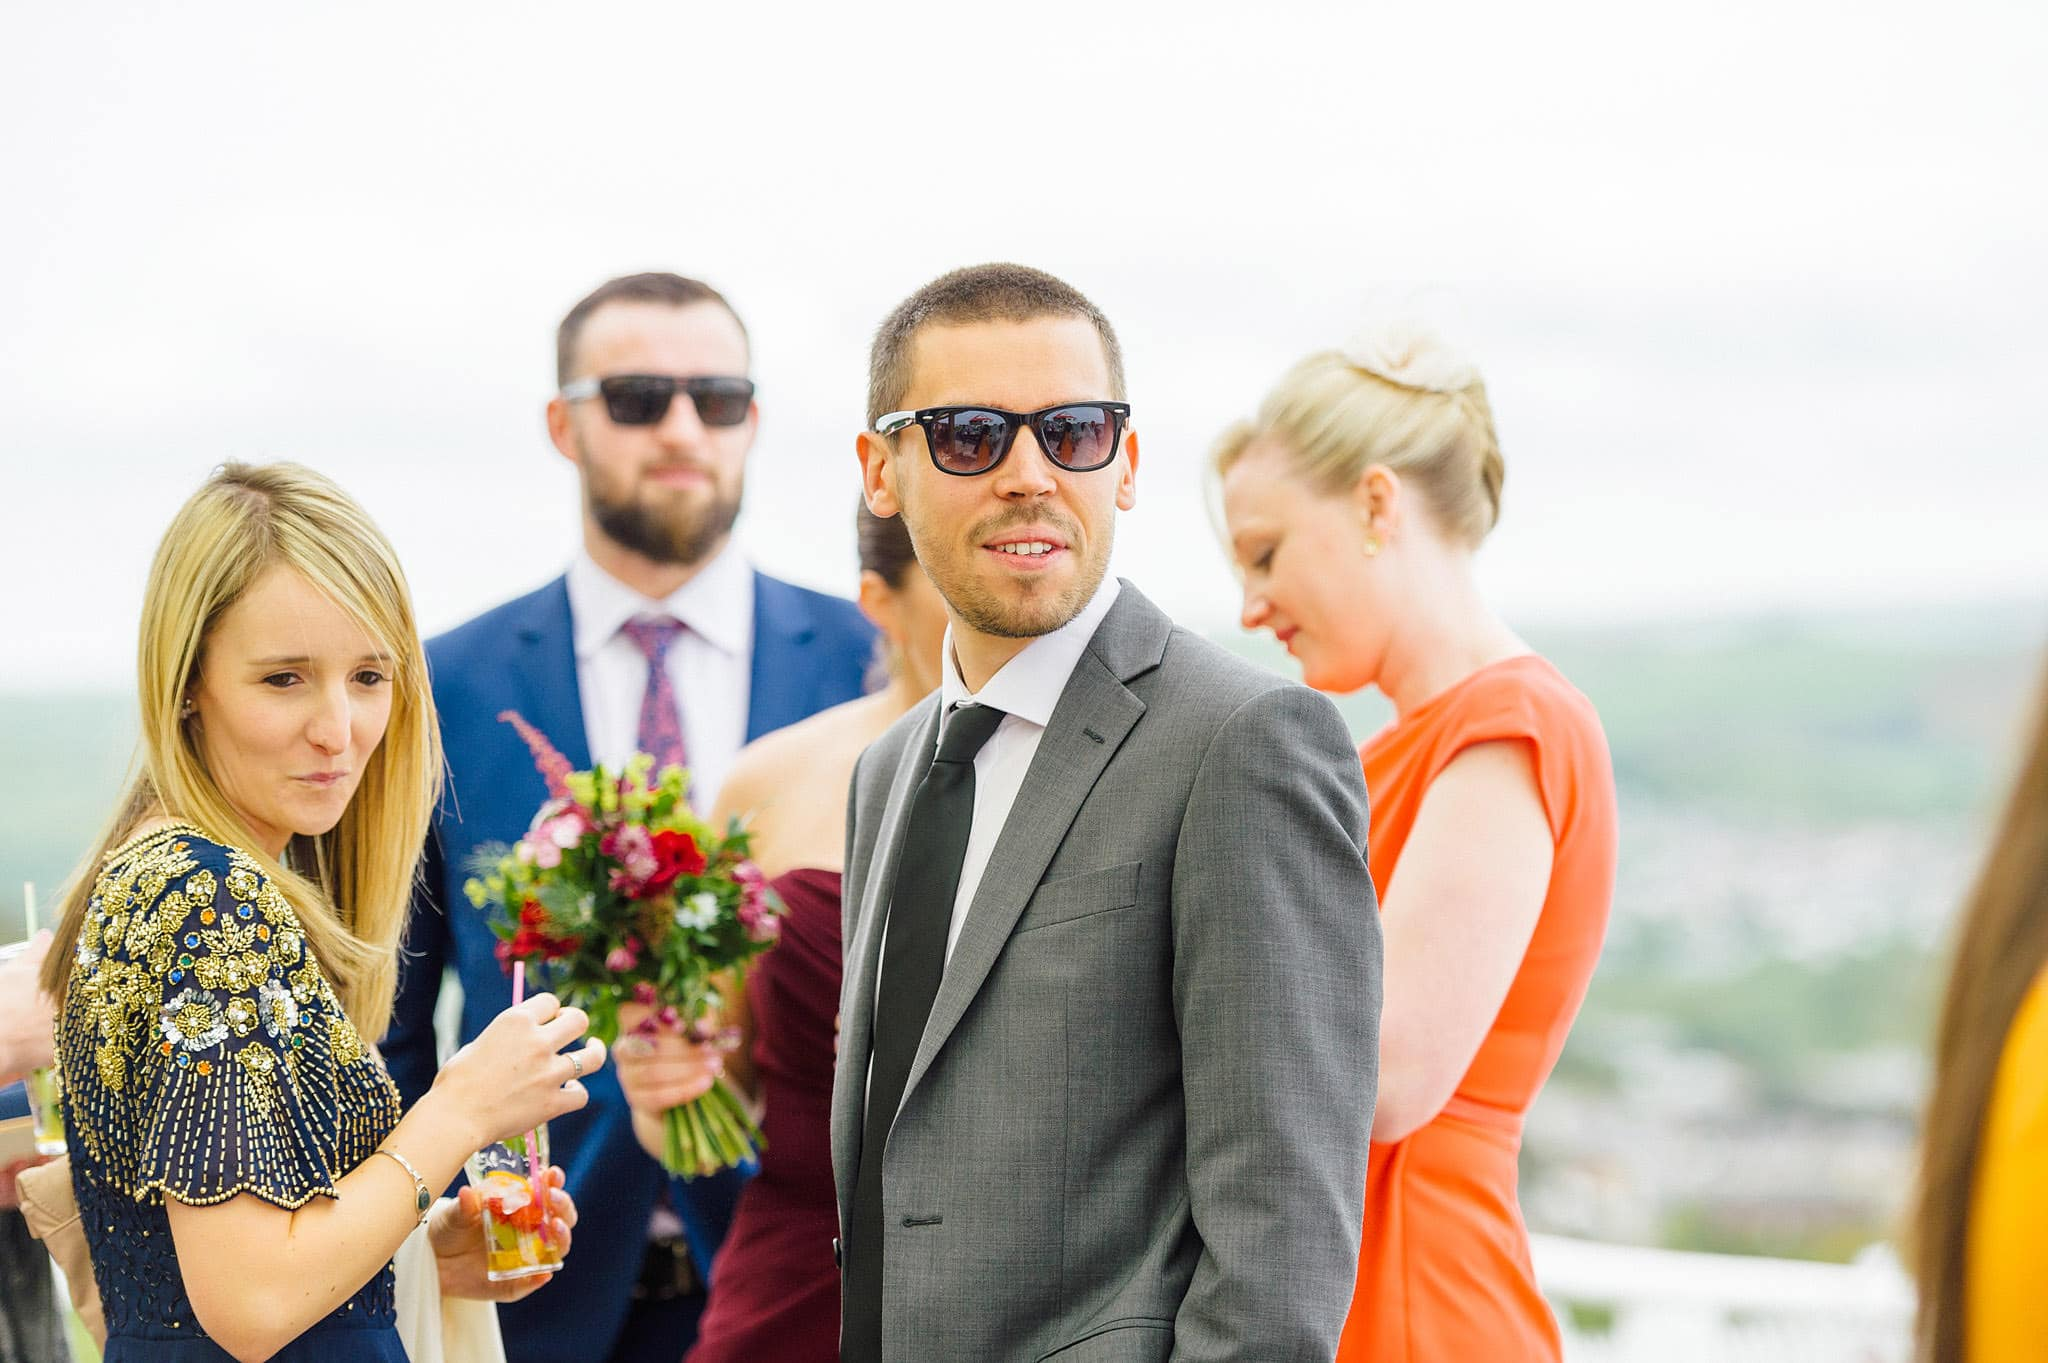 wedding-photographer-aberystwyth-wales (124)